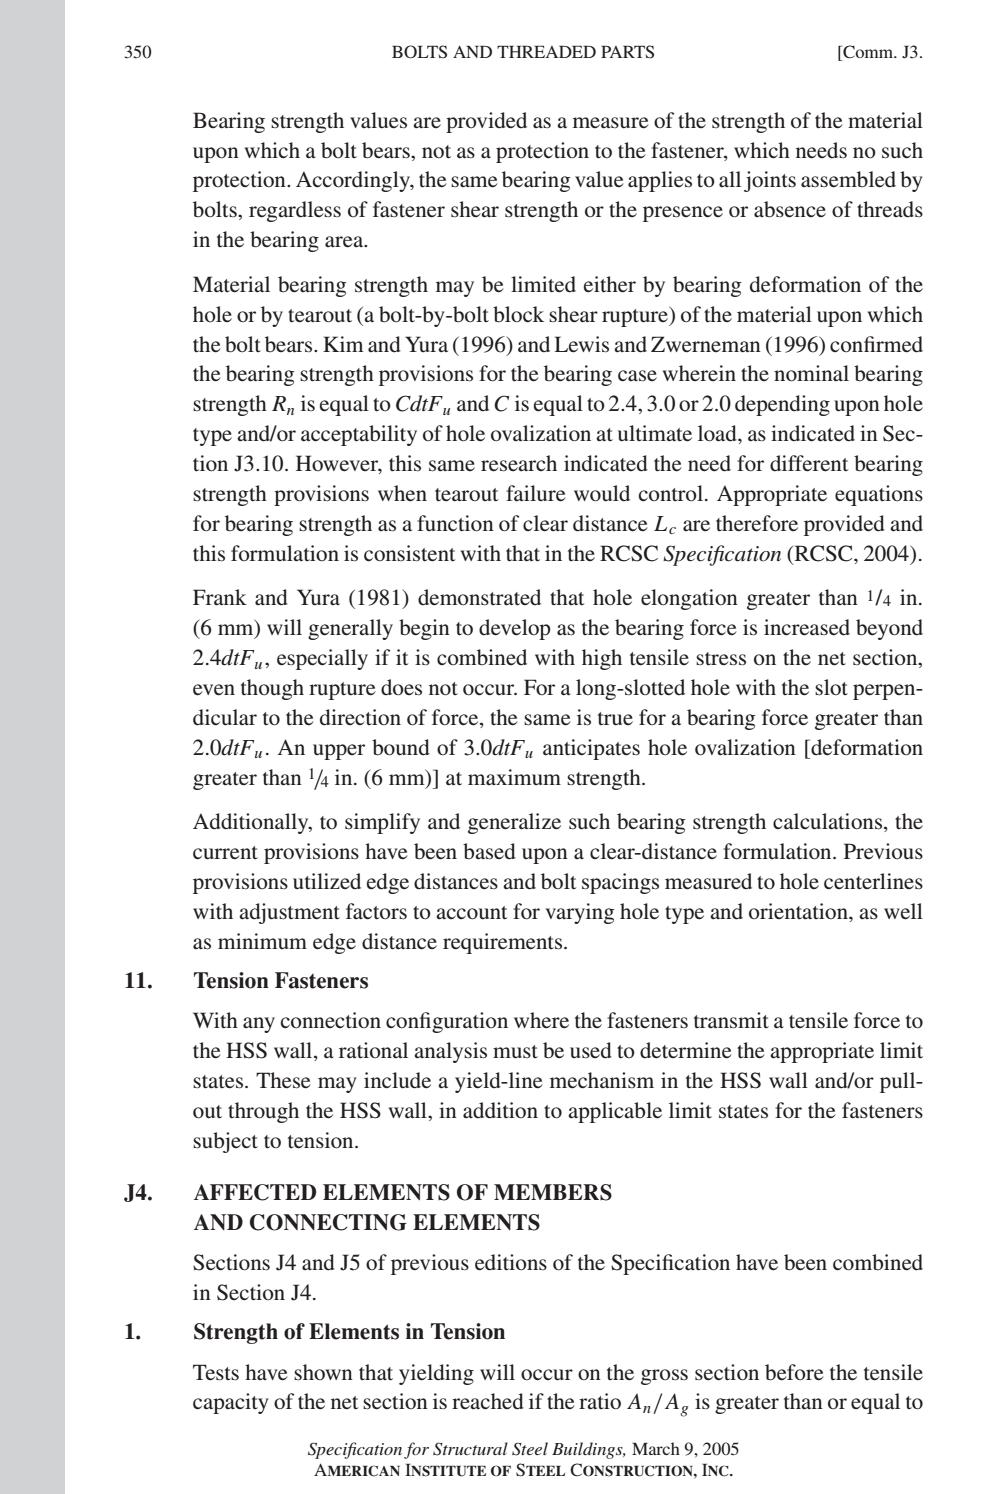 COMMENTARY ANSI/AISC 360-05 by Pedro Antonio Jiménez Sánchez